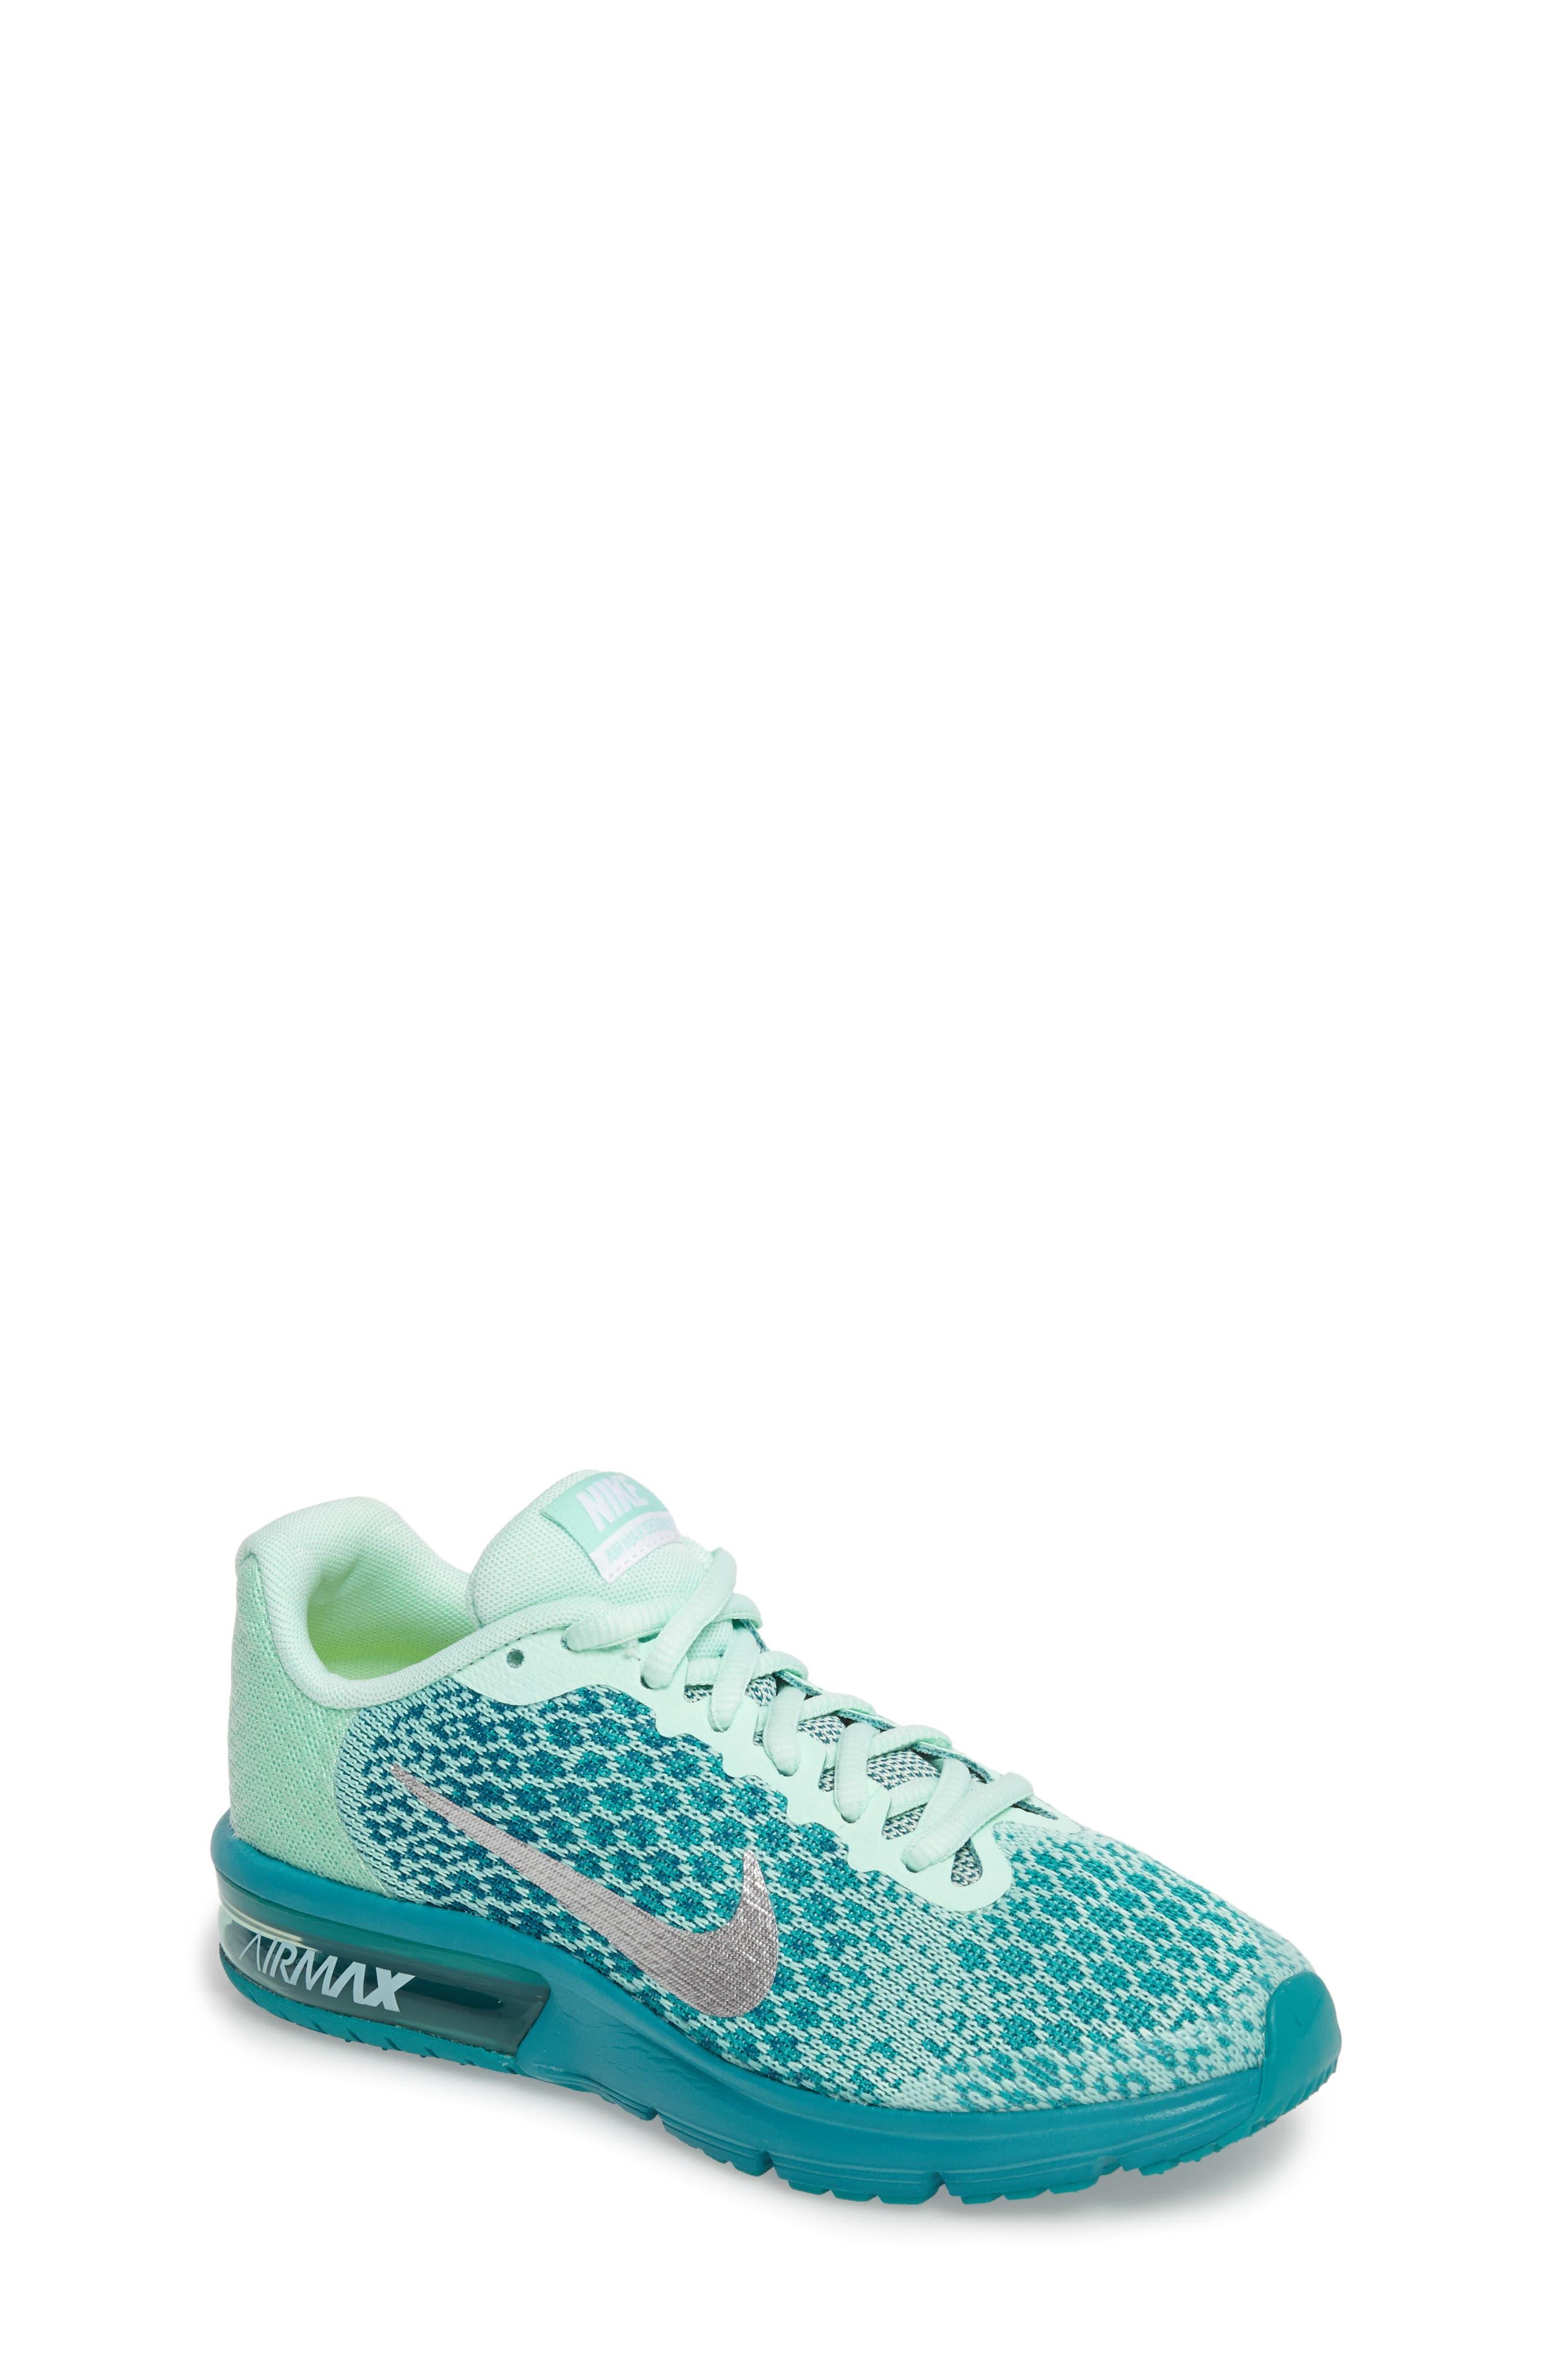 Alternate Image 1 Selected - Nike Air Max Sequent 2 Sneaker (Big Kid)